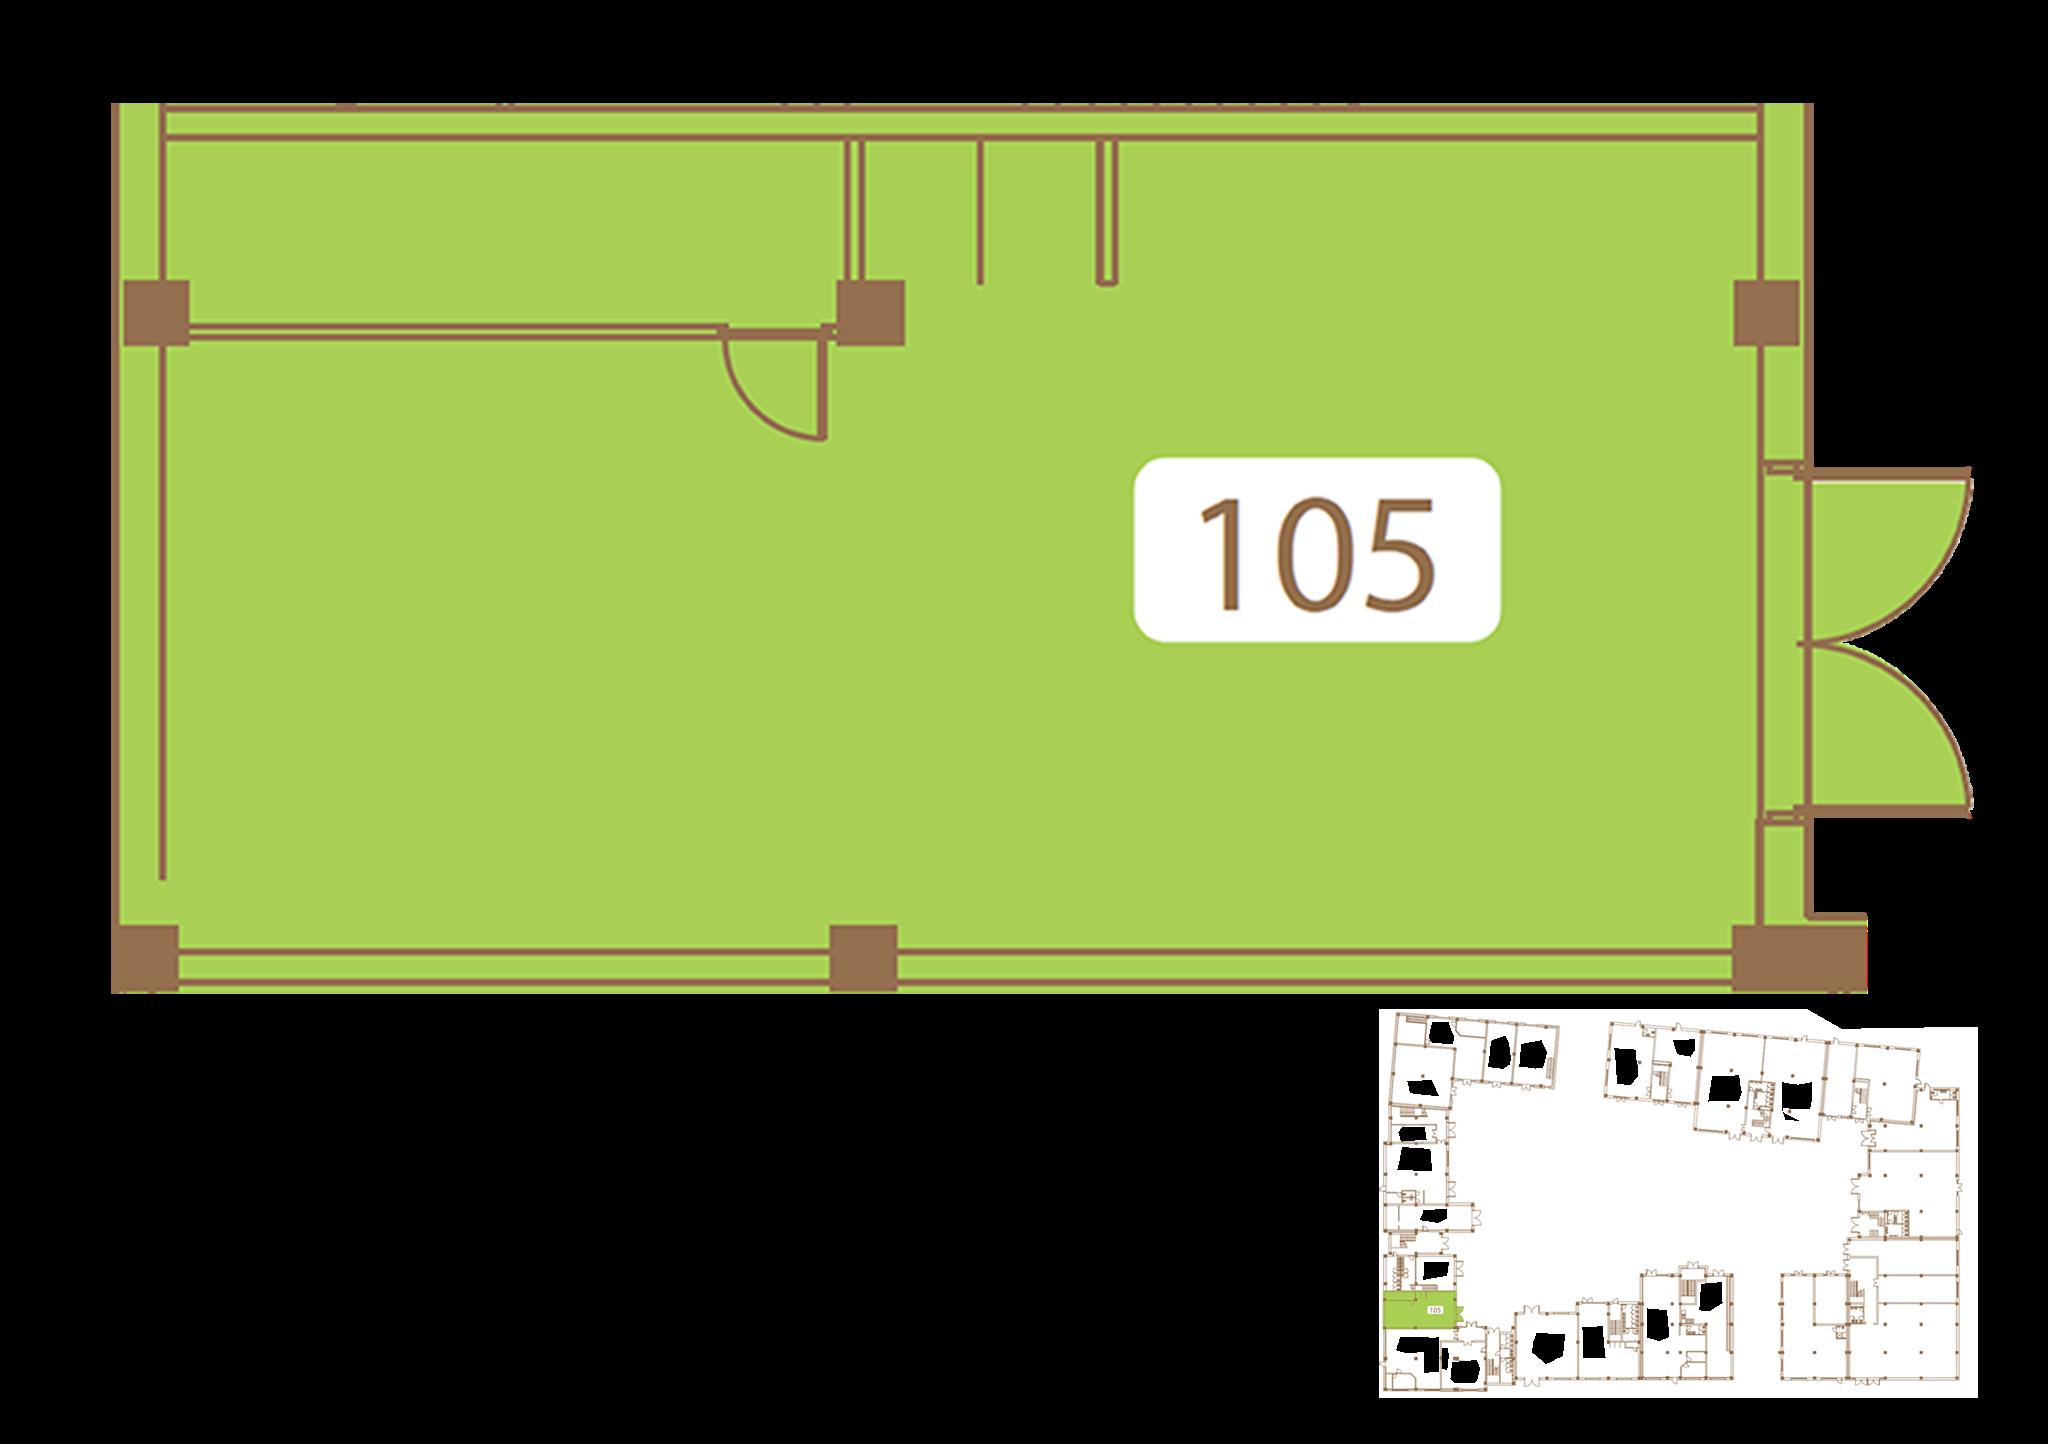 105x1